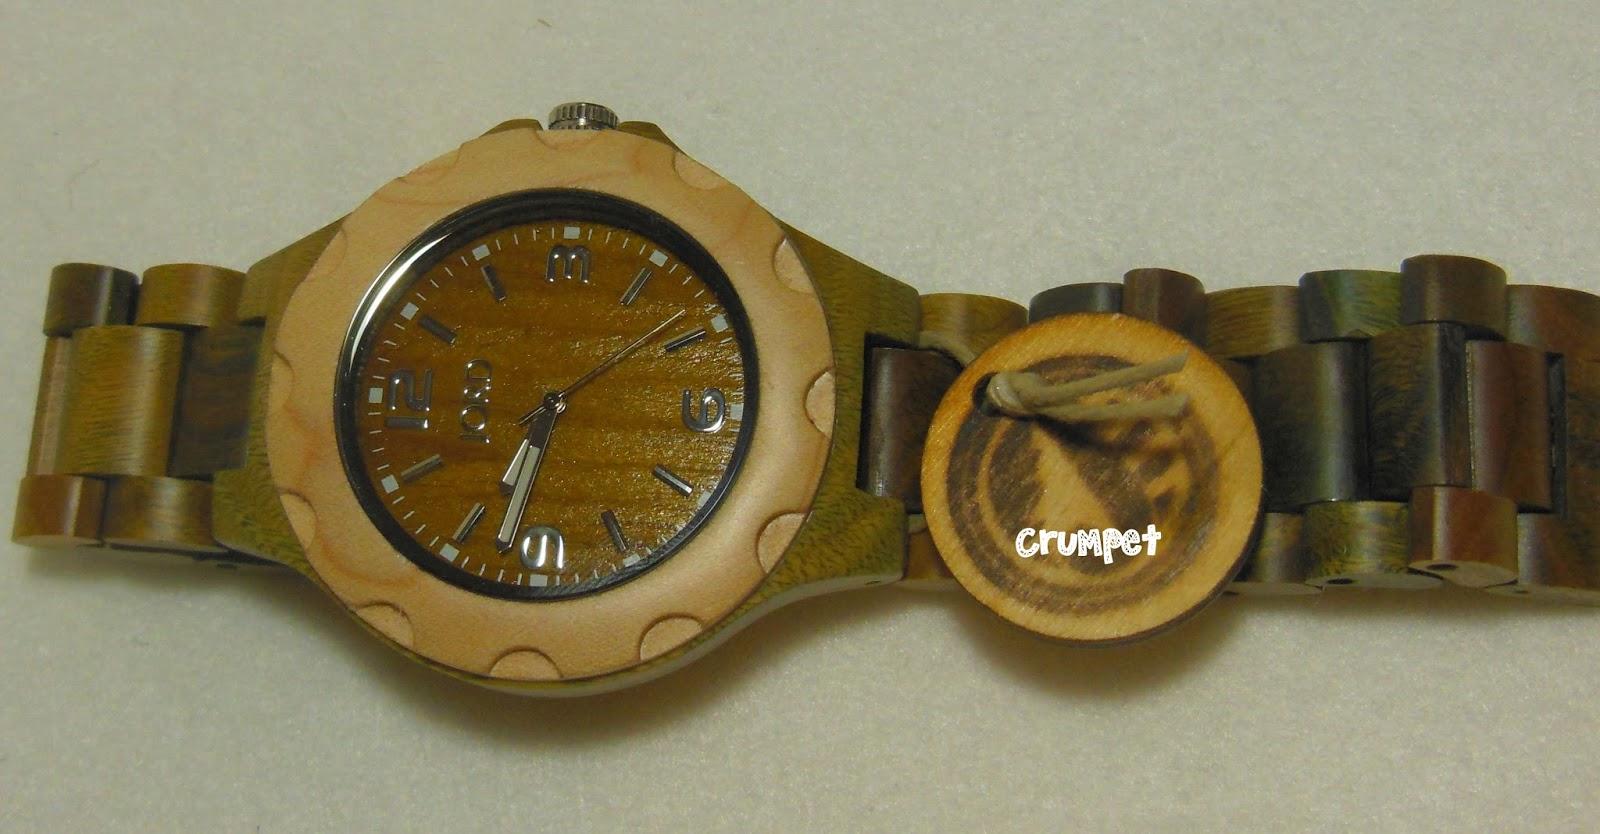 jord wood watches price